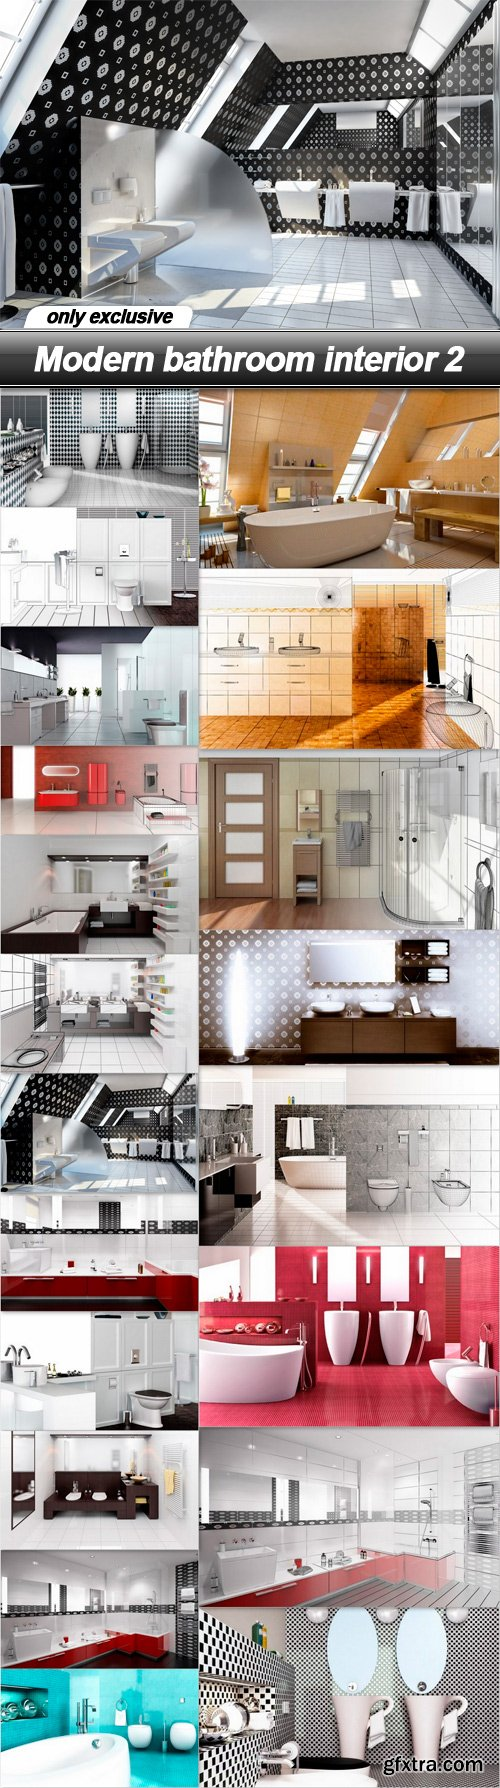 Modern bathroom interior 2 - 20 UHQ JPEG